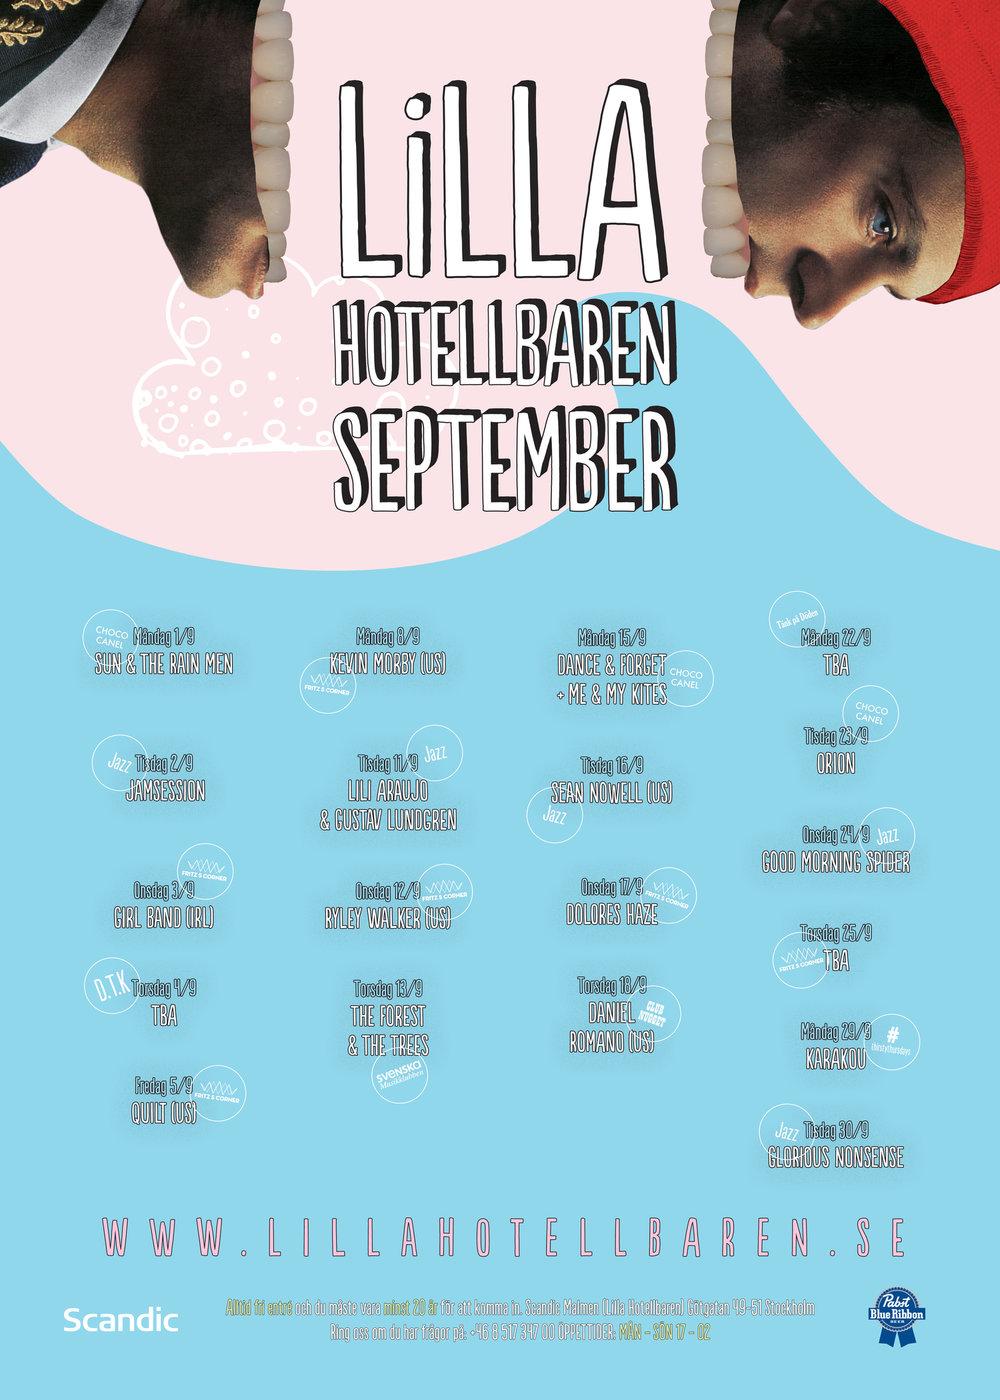 LILLA+HOTELLBAREN_Affisch_september_web.jpg